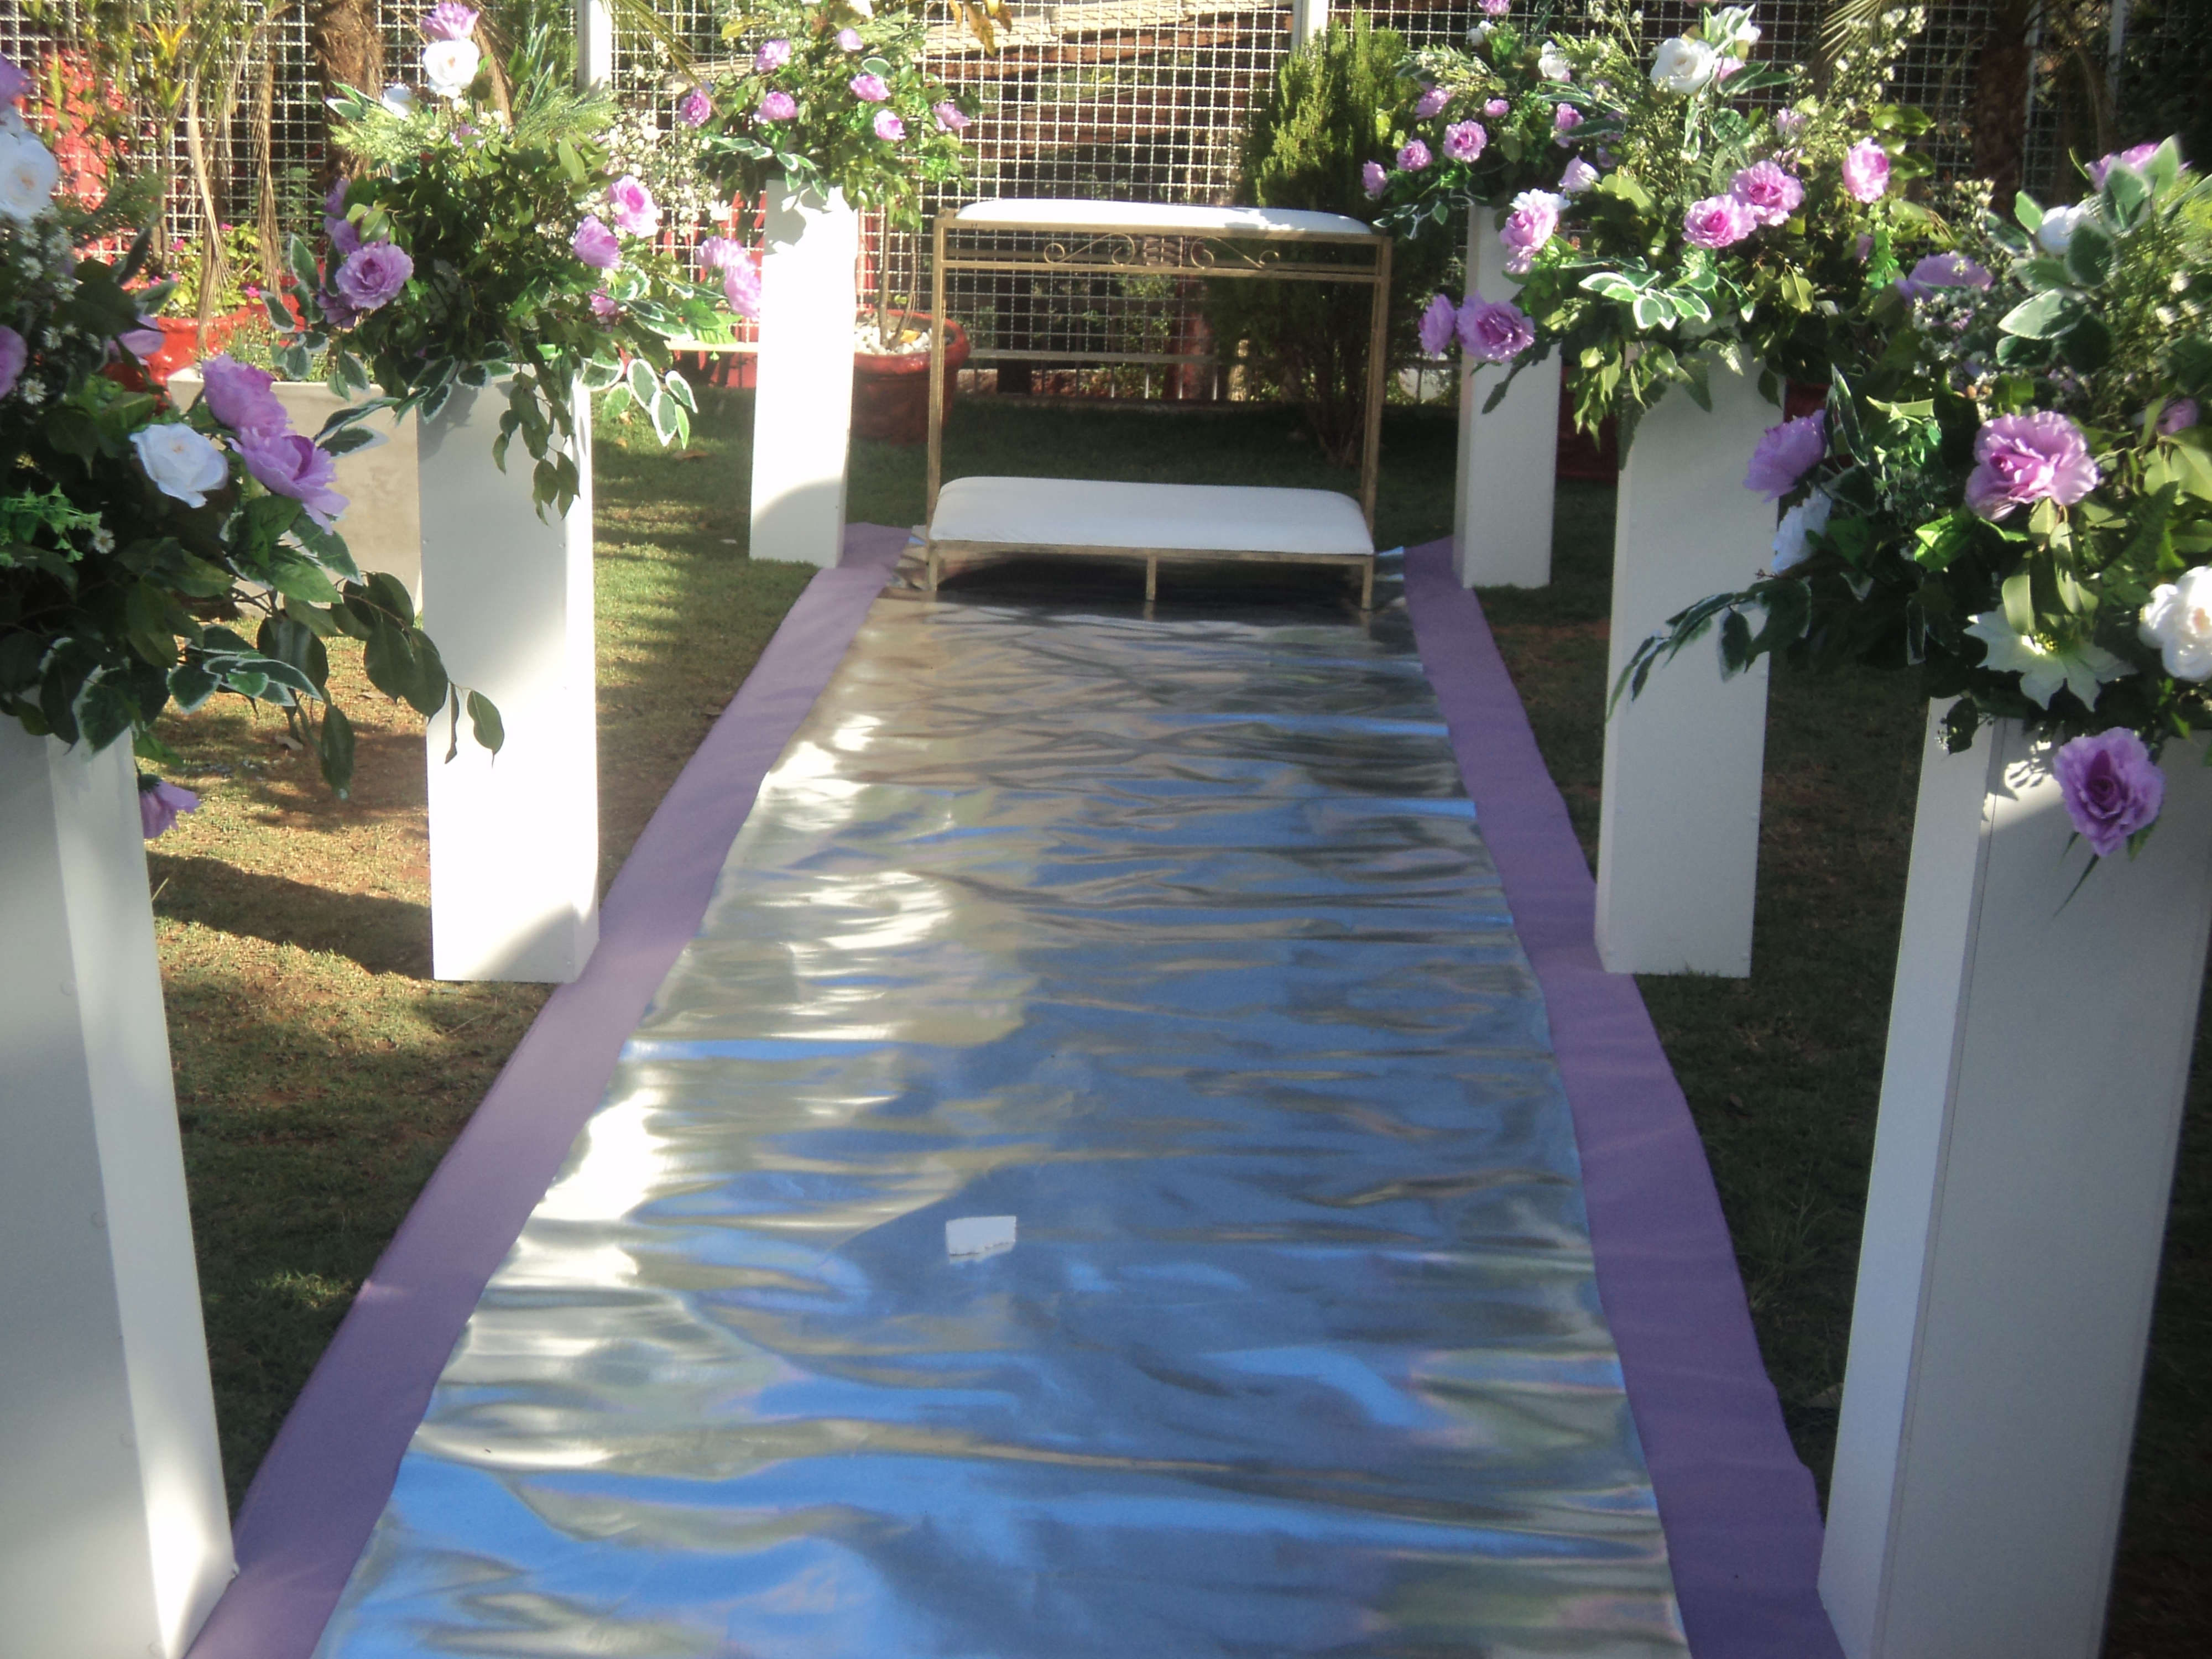 Kit higiene flores lil s mana art e personaliza o elo7 for Tapete teenager